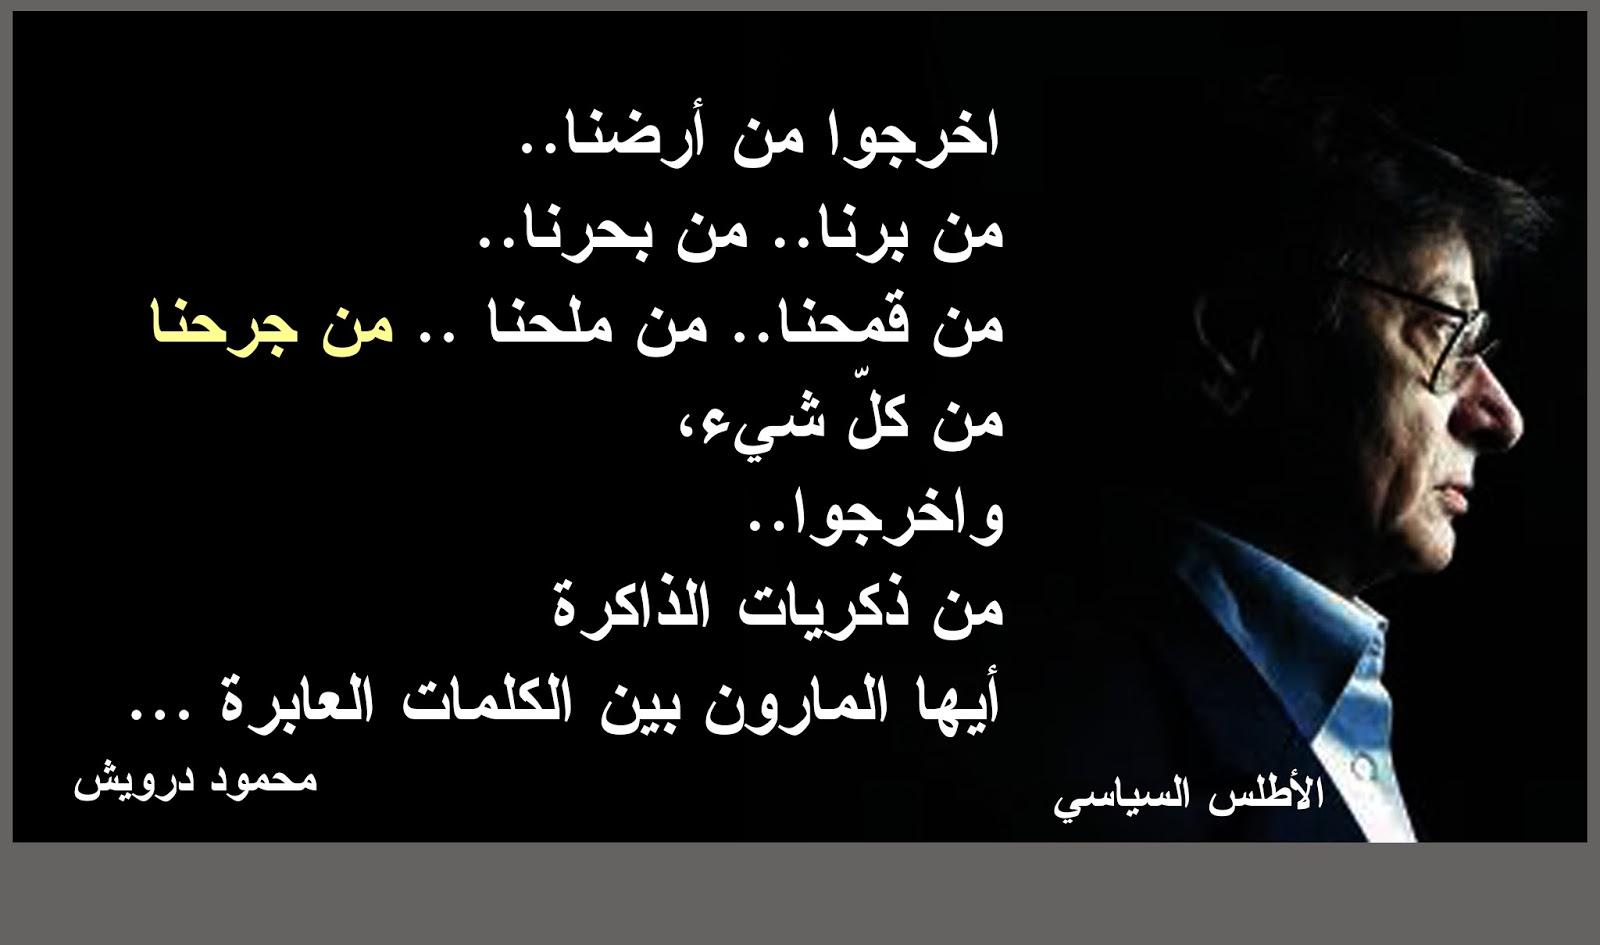 صوره شعر محمود درويش , اجمل الاشعار